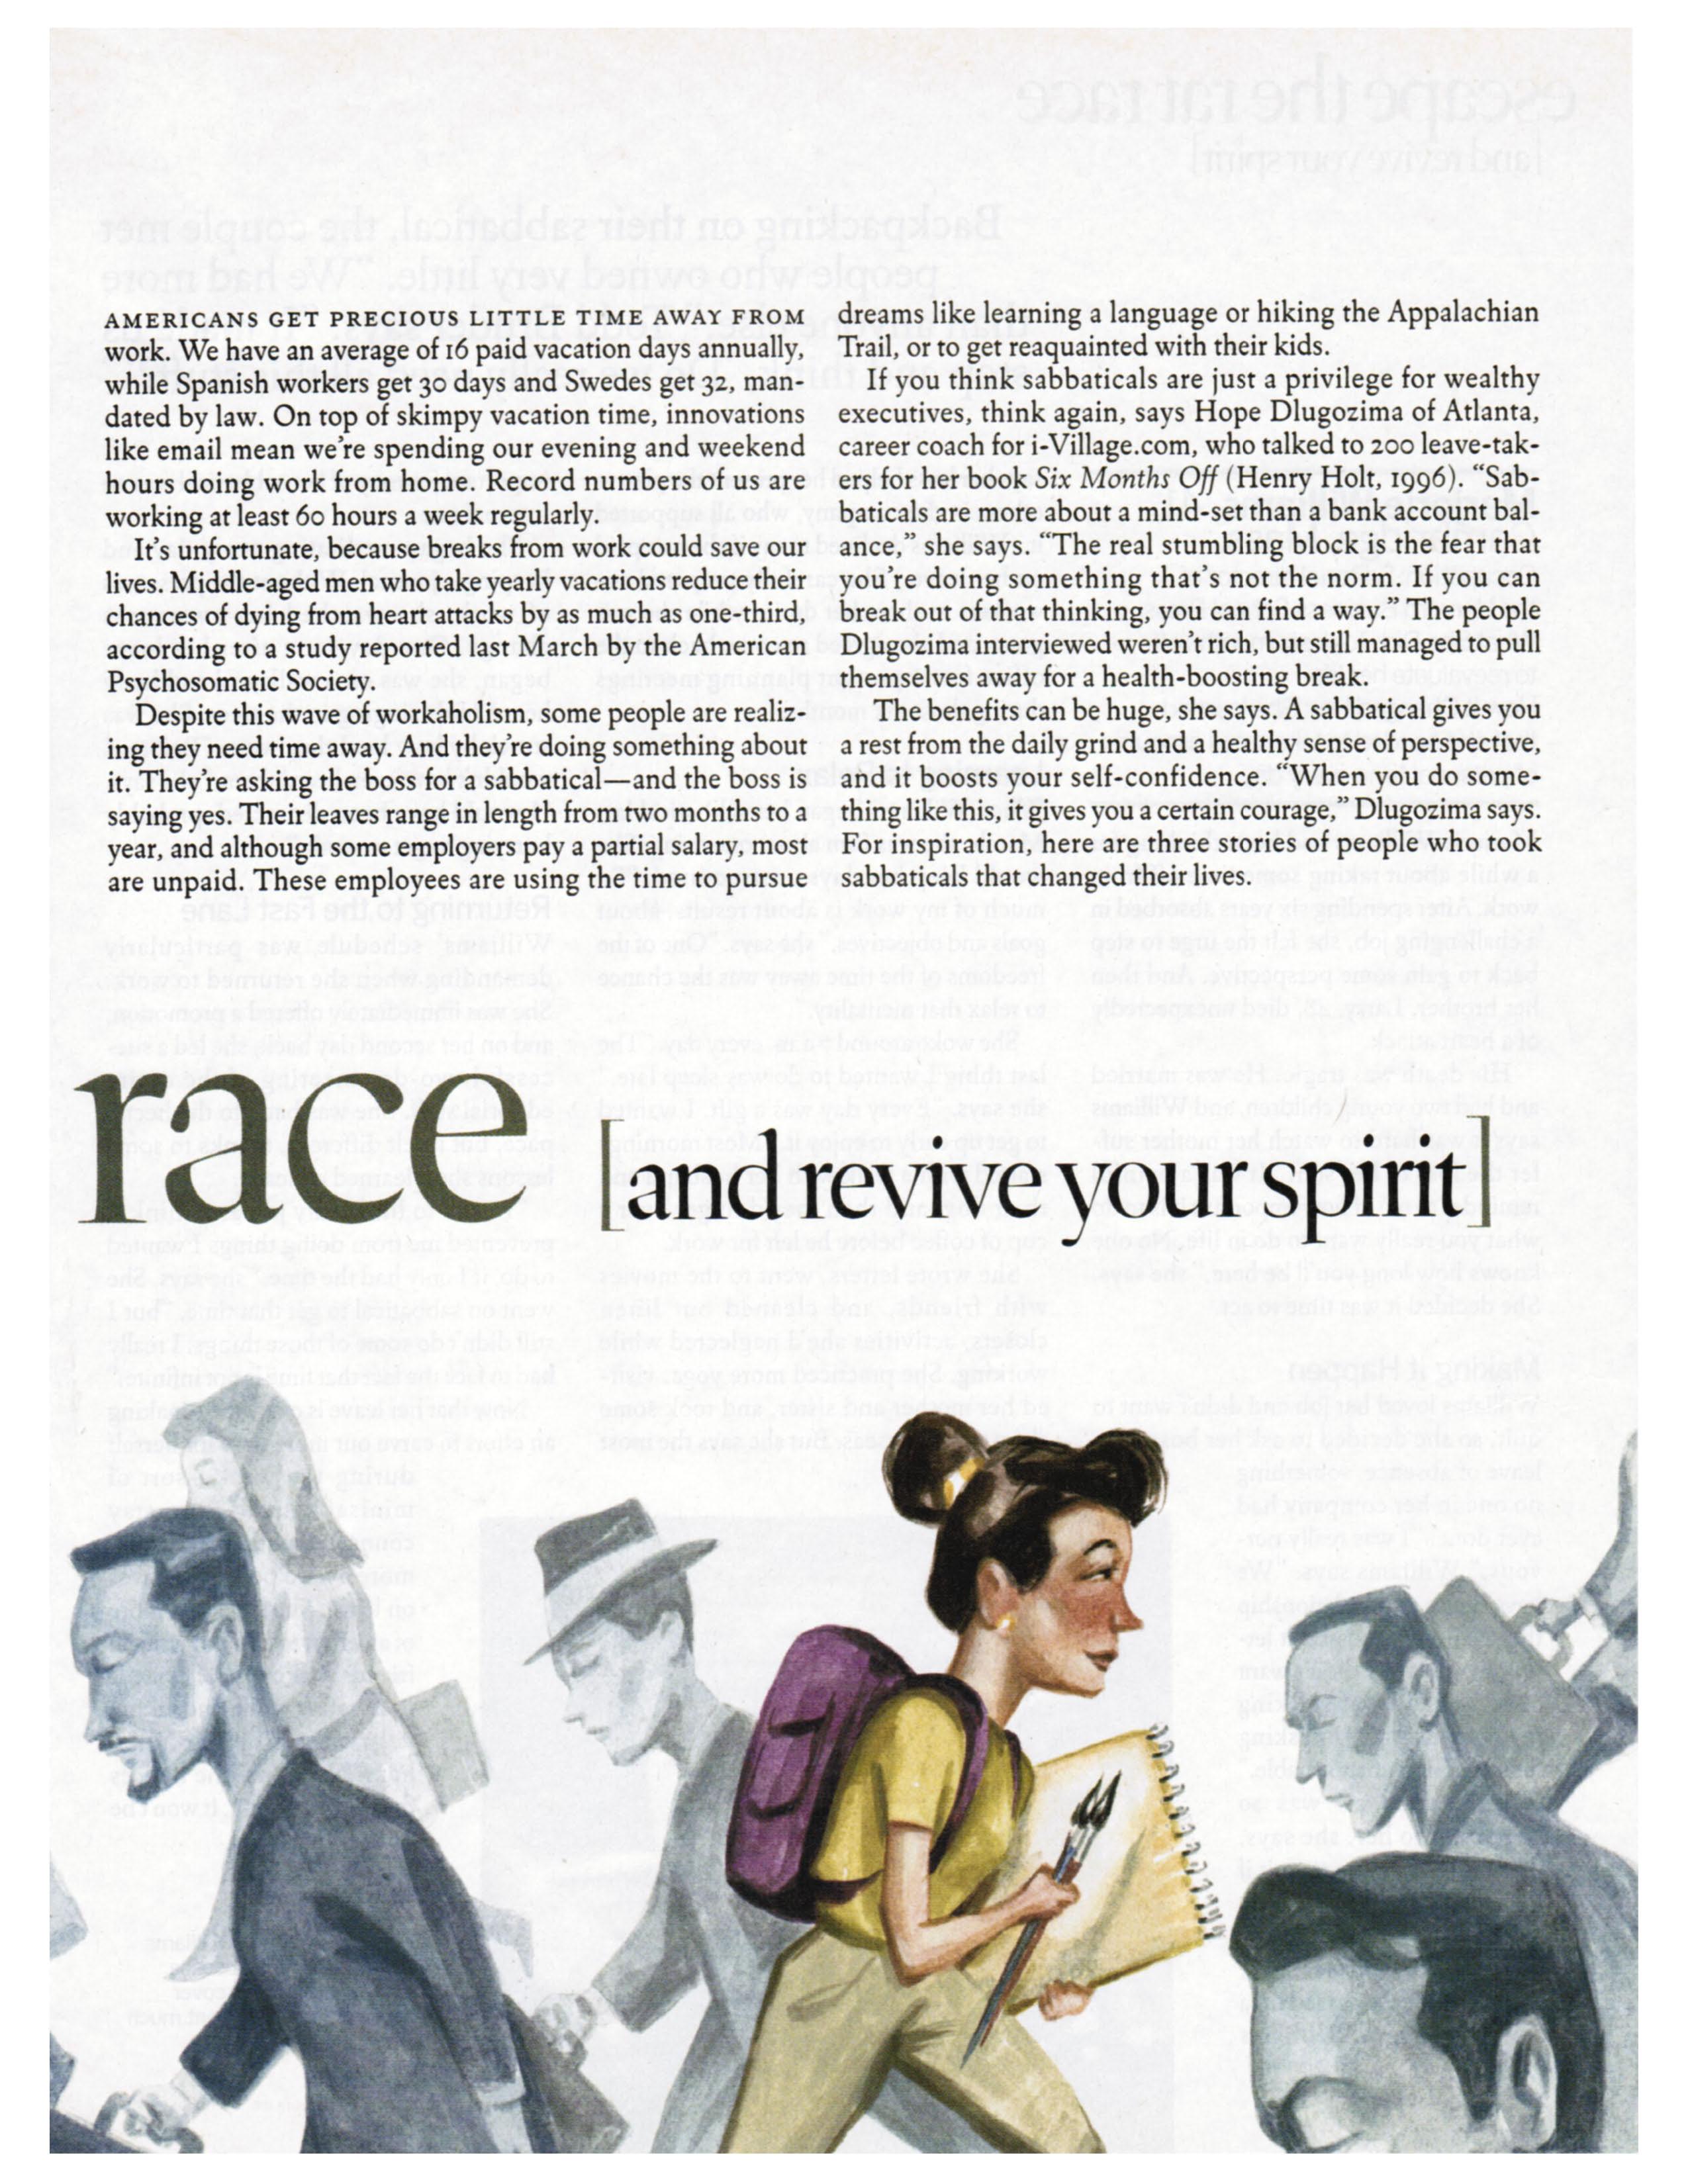 Escape the Rat Race and Revive Your Spirit